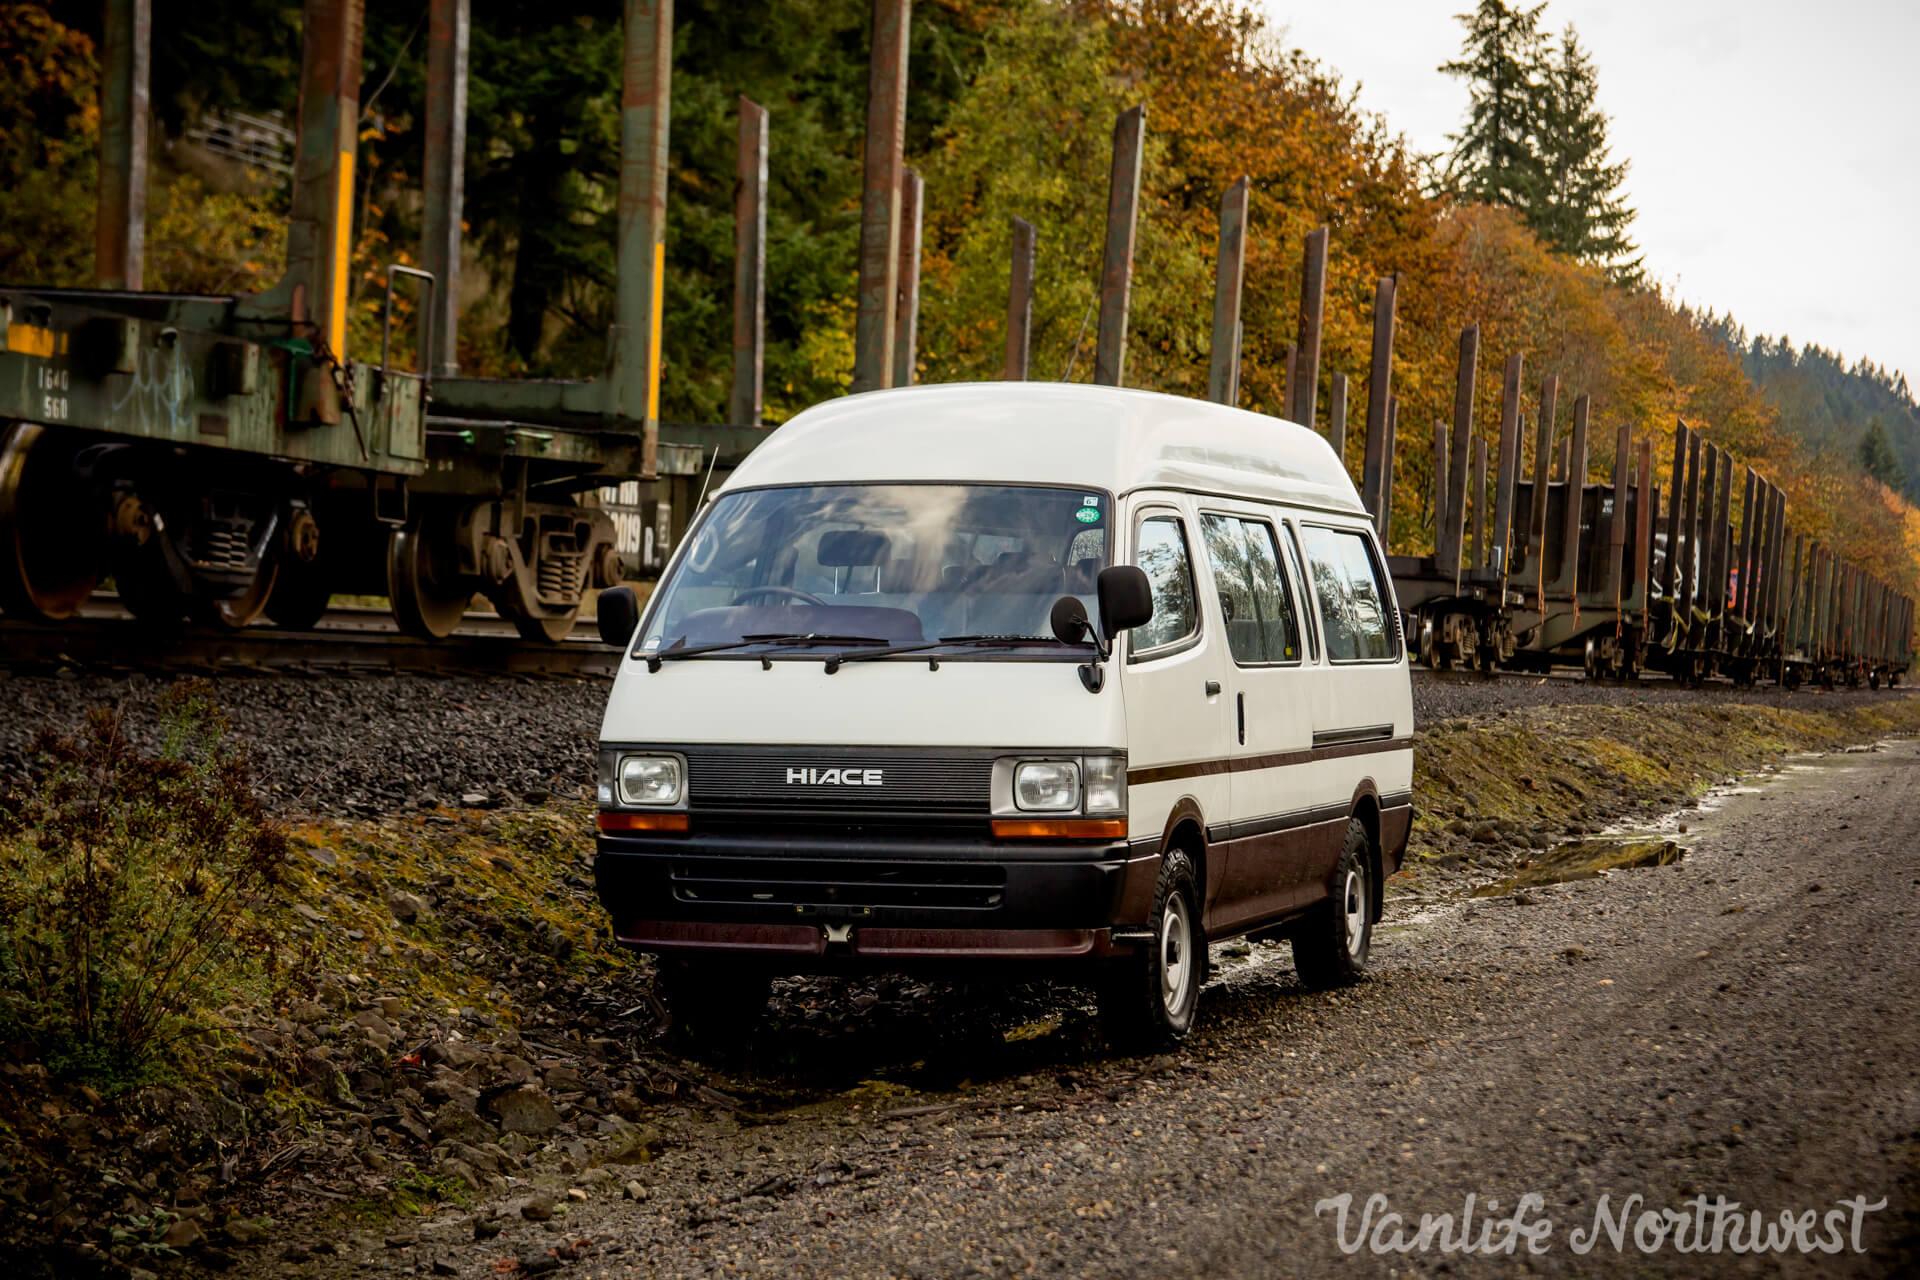 1993ToyotaHiaceCommuterBus2wdNormL-5.jpg